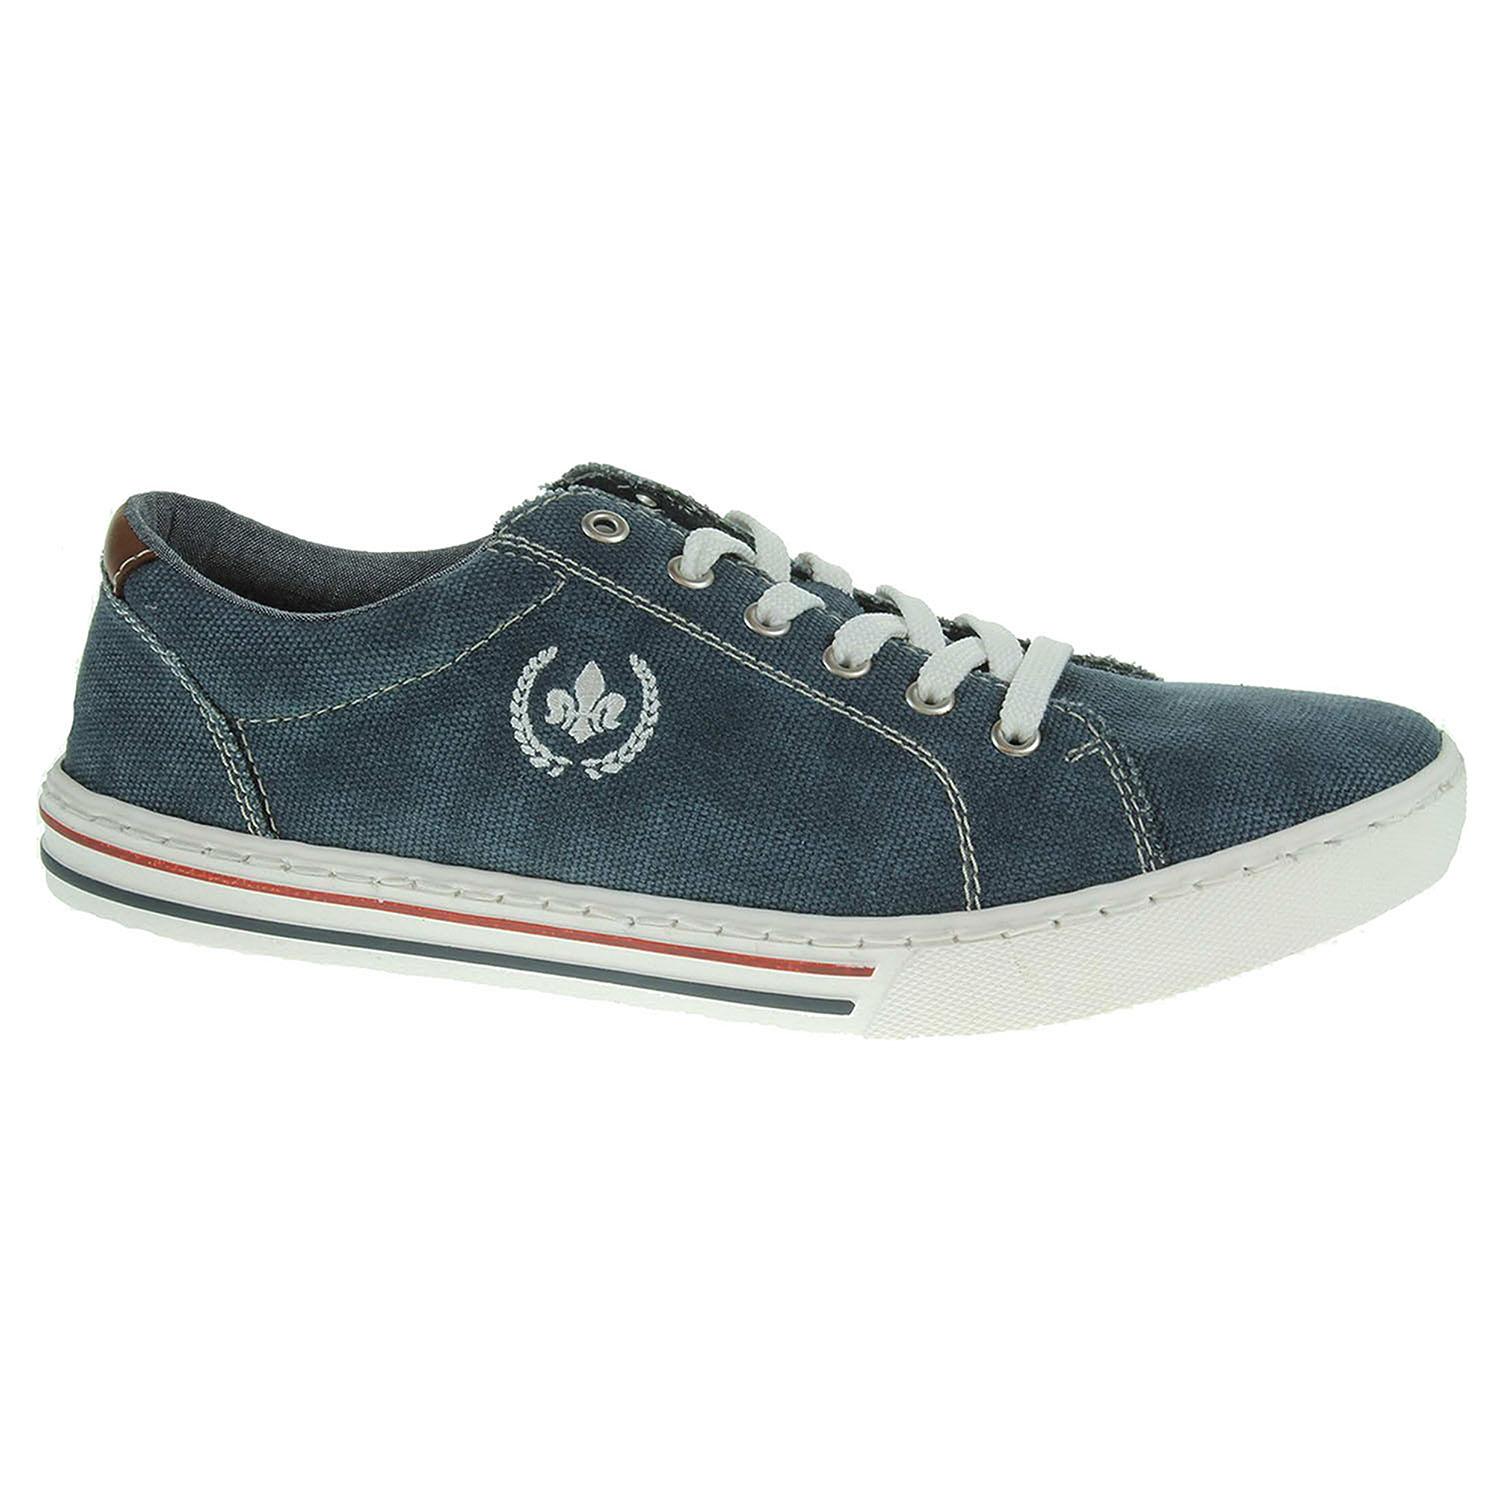 Pánská obuv Rieker 19501-14 modrá 46